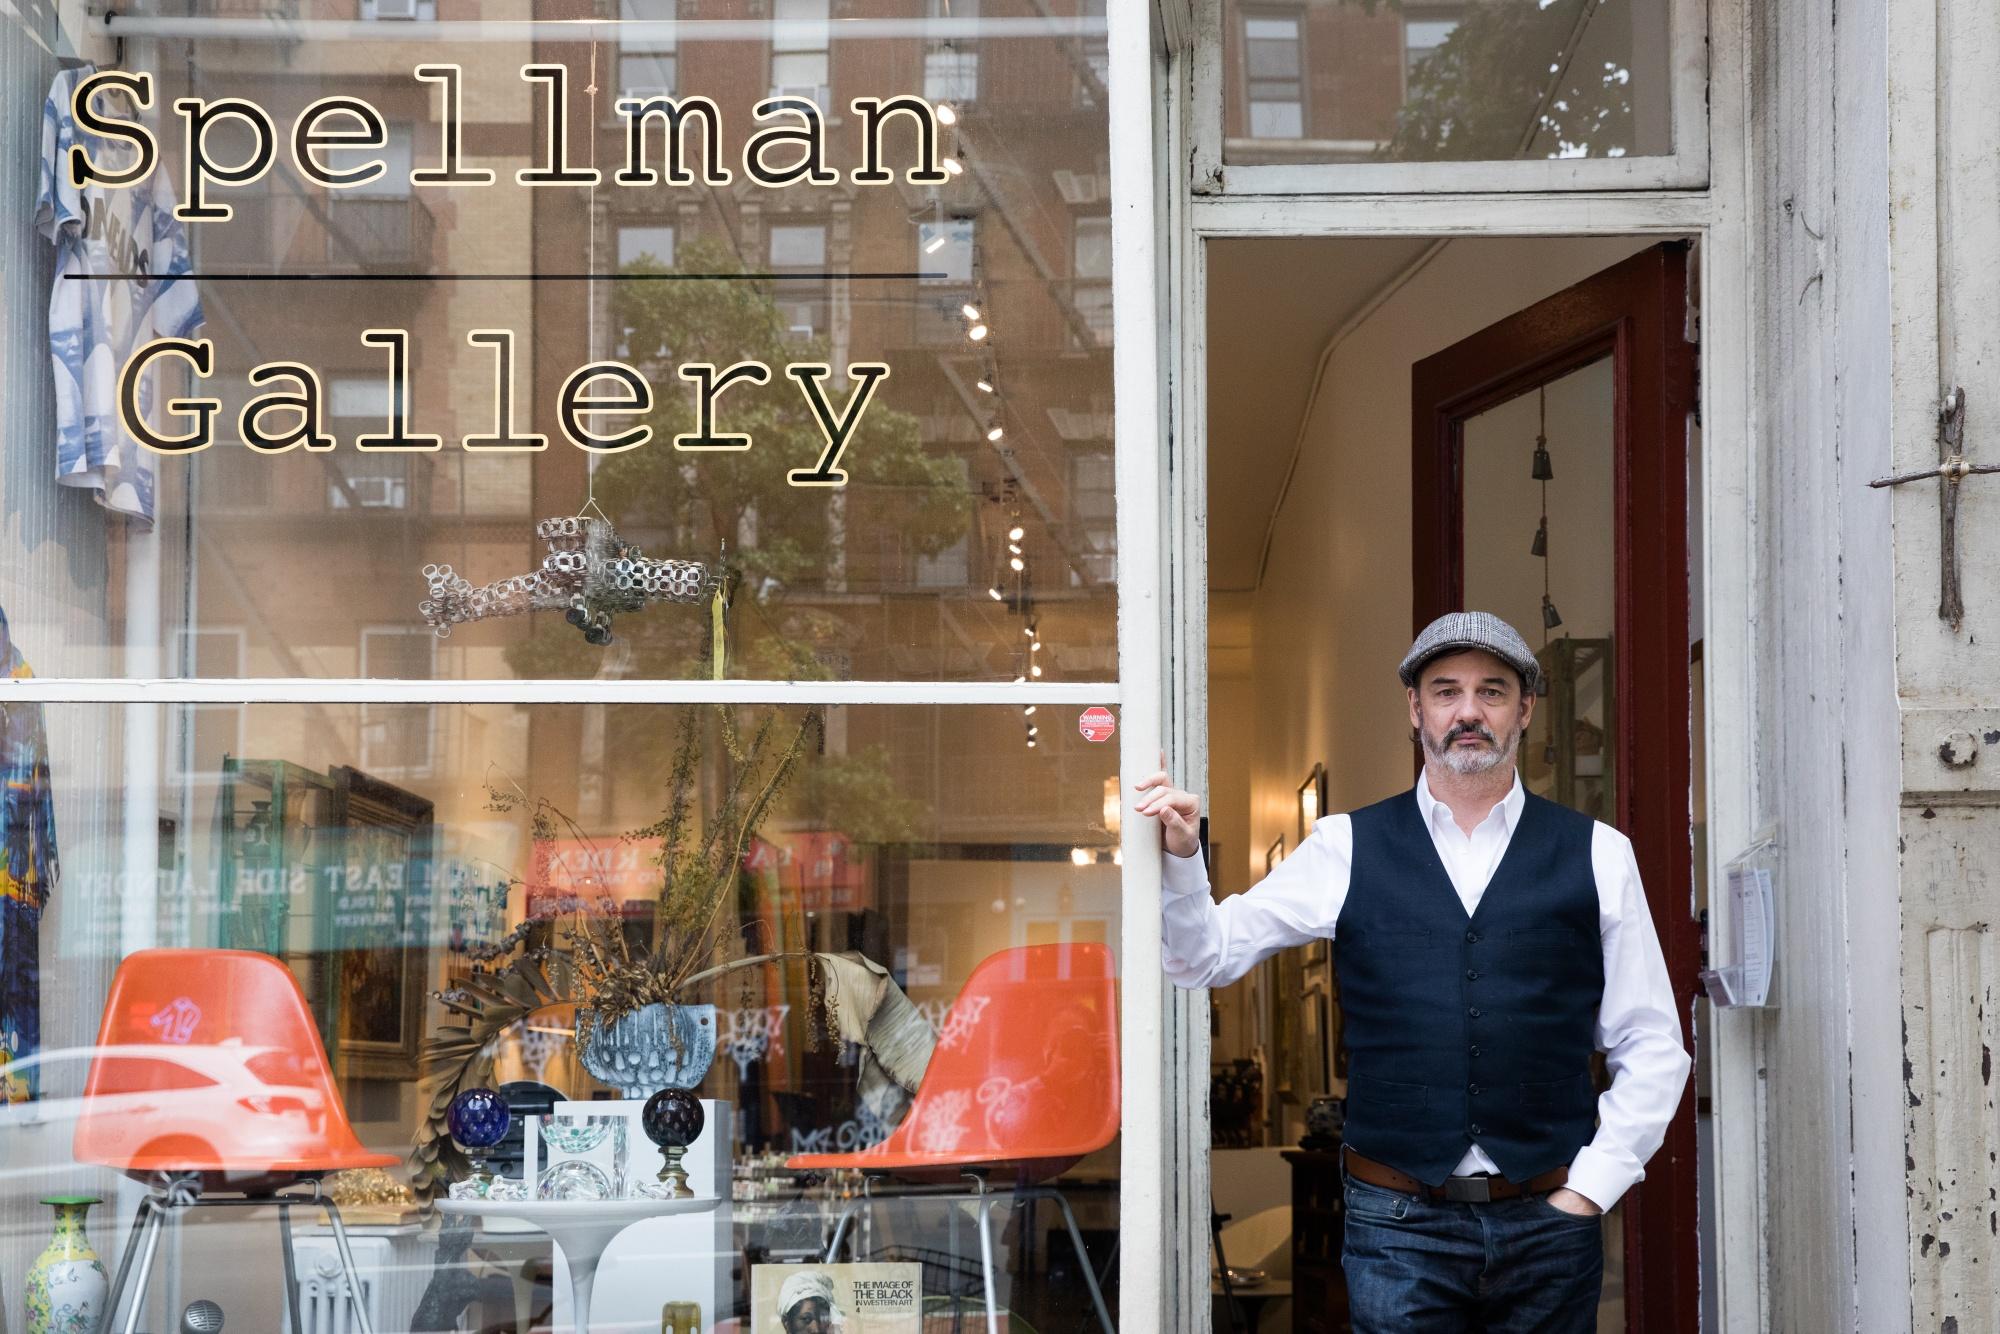 Glenn Spellmanat his Upper East Side gallery.